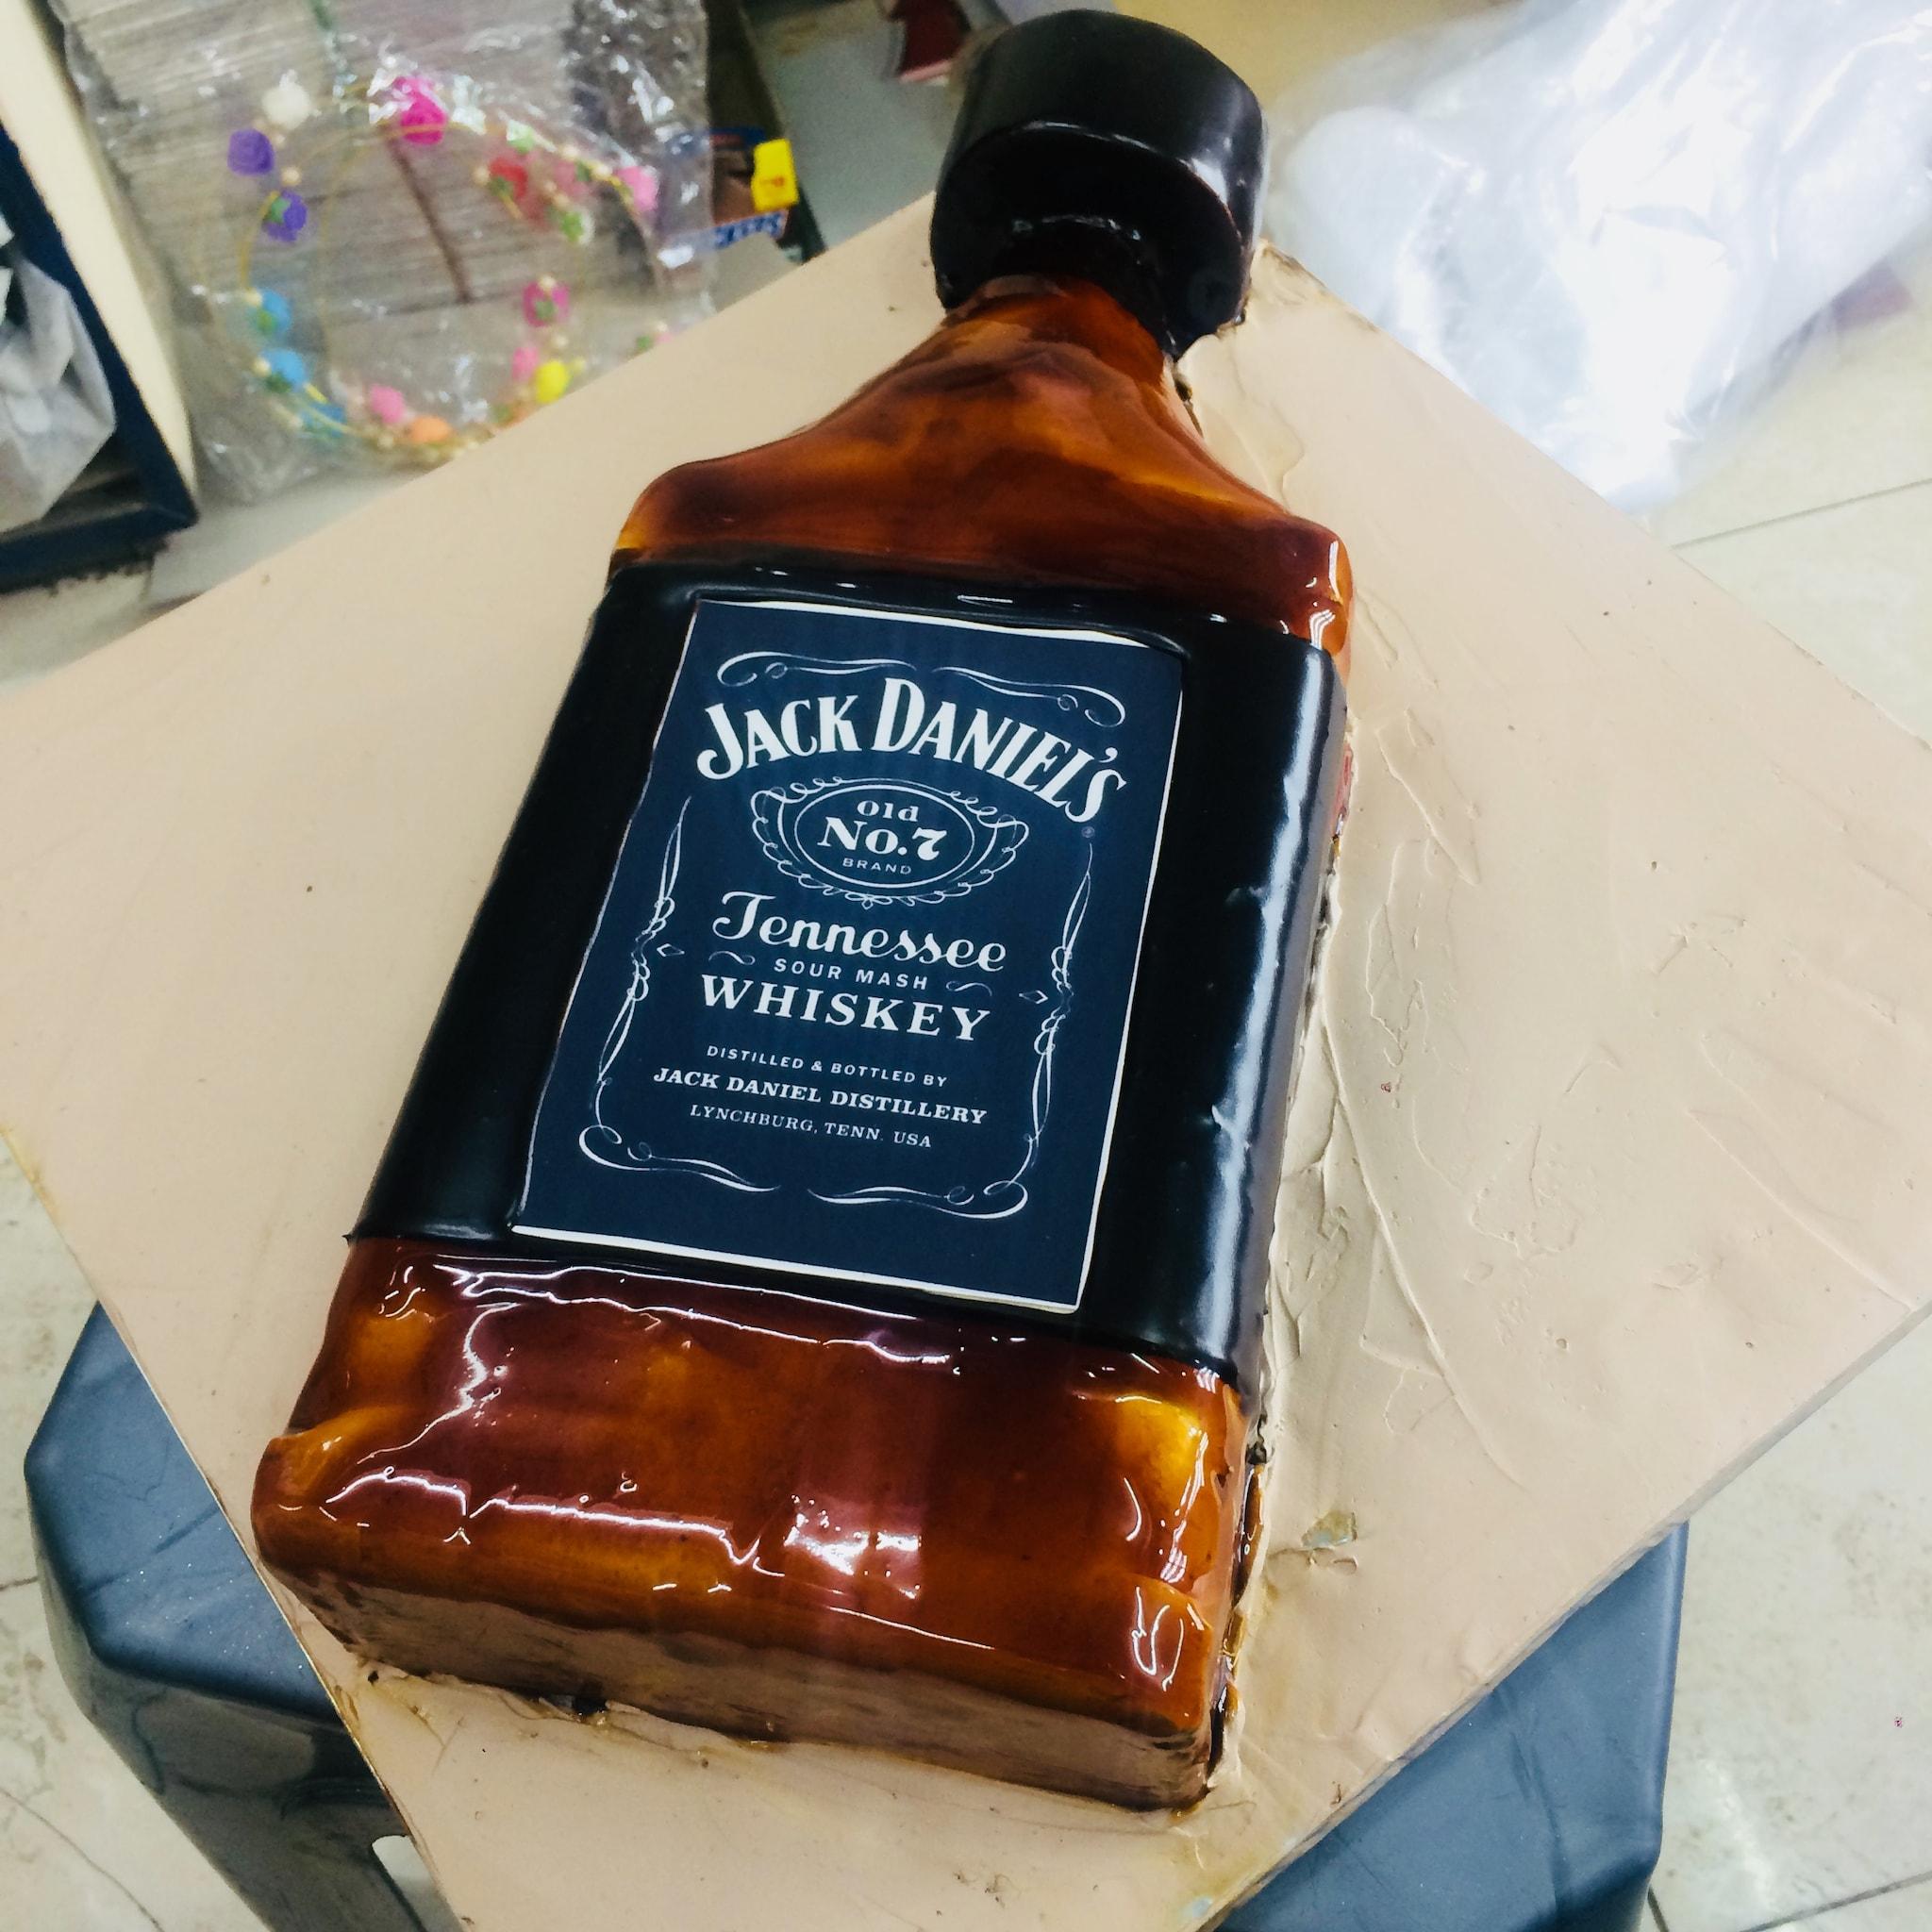 Jack Daniels Cake (1.5 Kg,Chocolate)